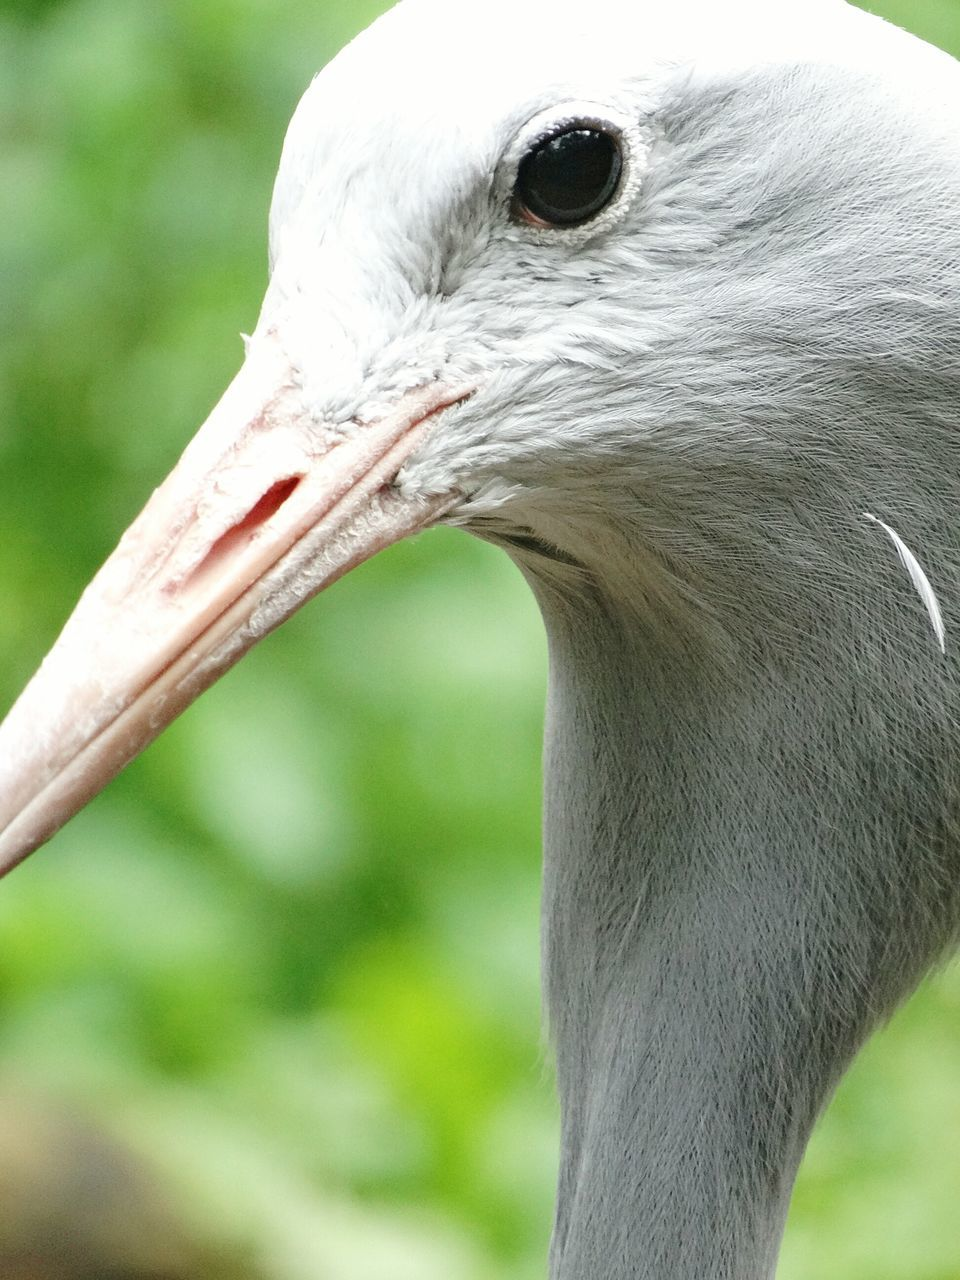 beak, bird, one animal, animal themes, animals in the wild, focus on foreground, animal head, animal wildlife, close-up, day, nature, no people, outdoors, pelican, crane - bird